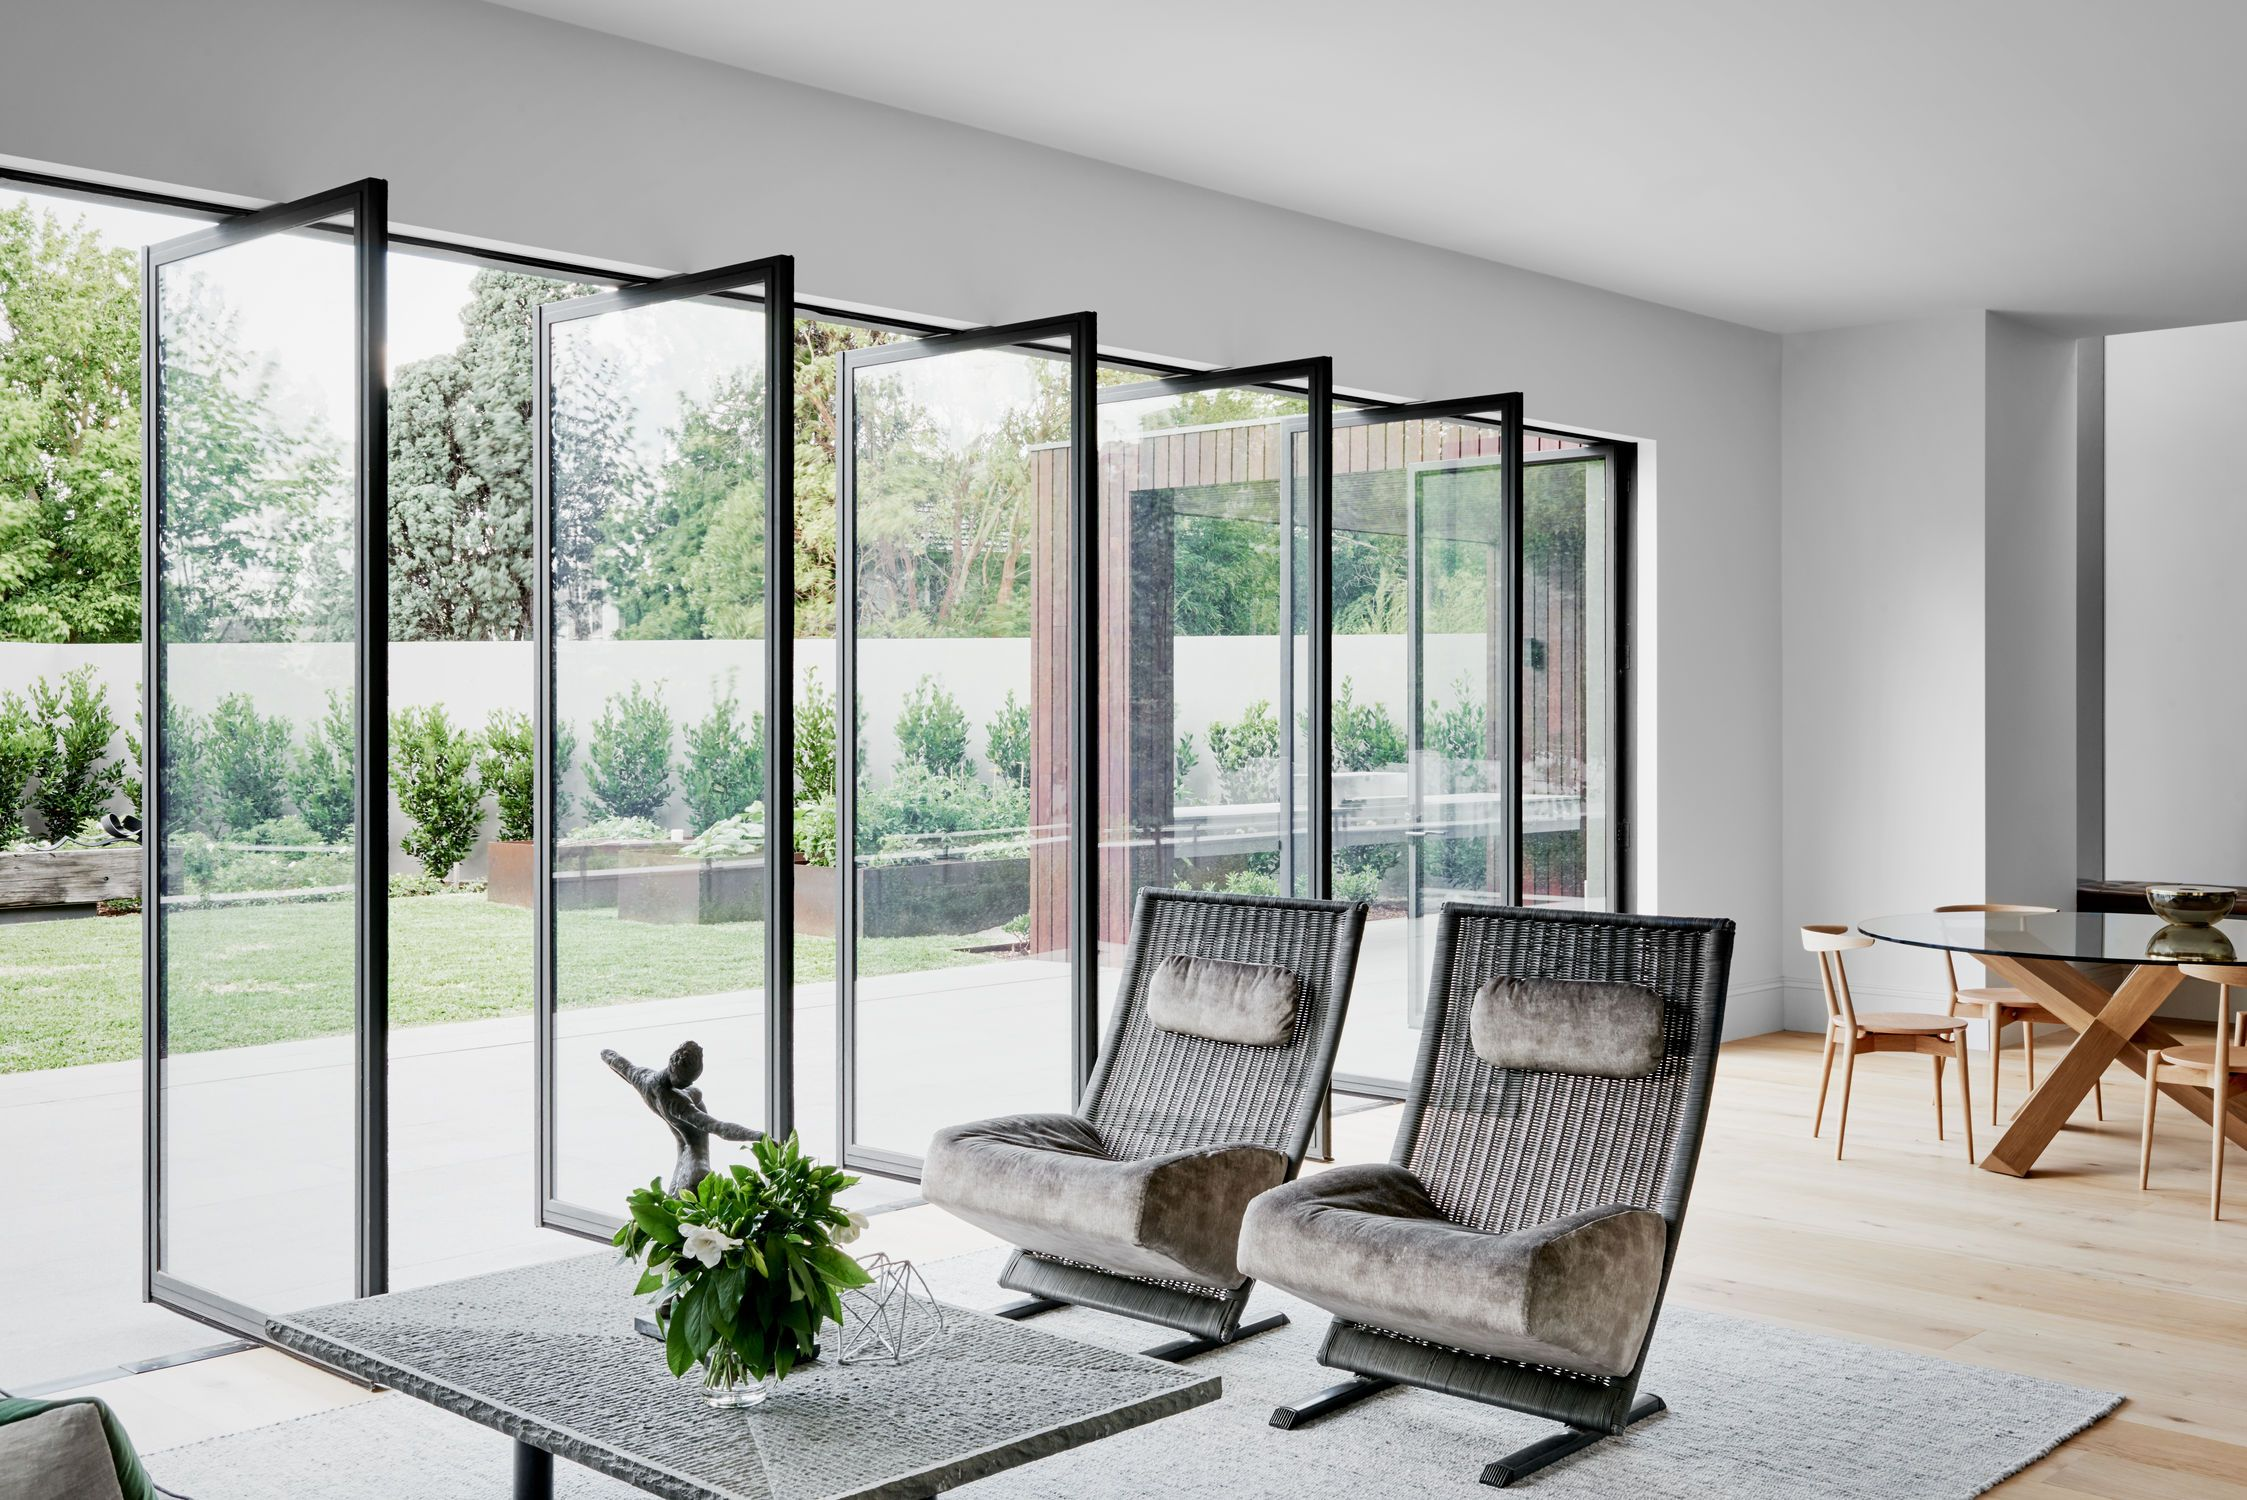 Robson Rak Architects - #Livingroom #Windowwall #Movablewall Pivot Doorssliding